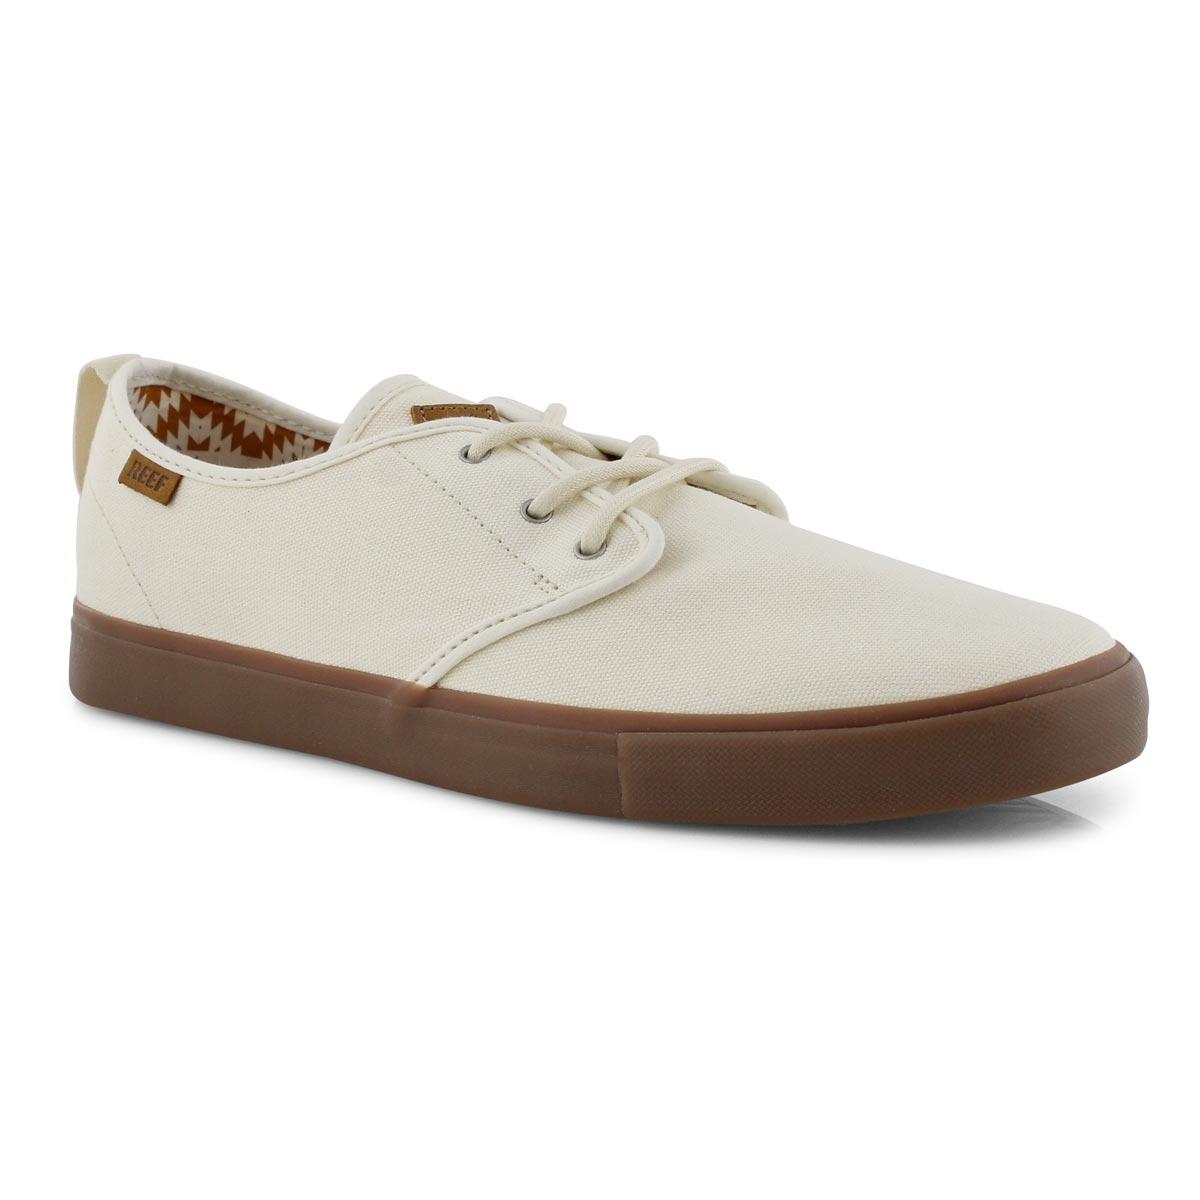 Mns Reef Landis 2 vntge lace up sneaker